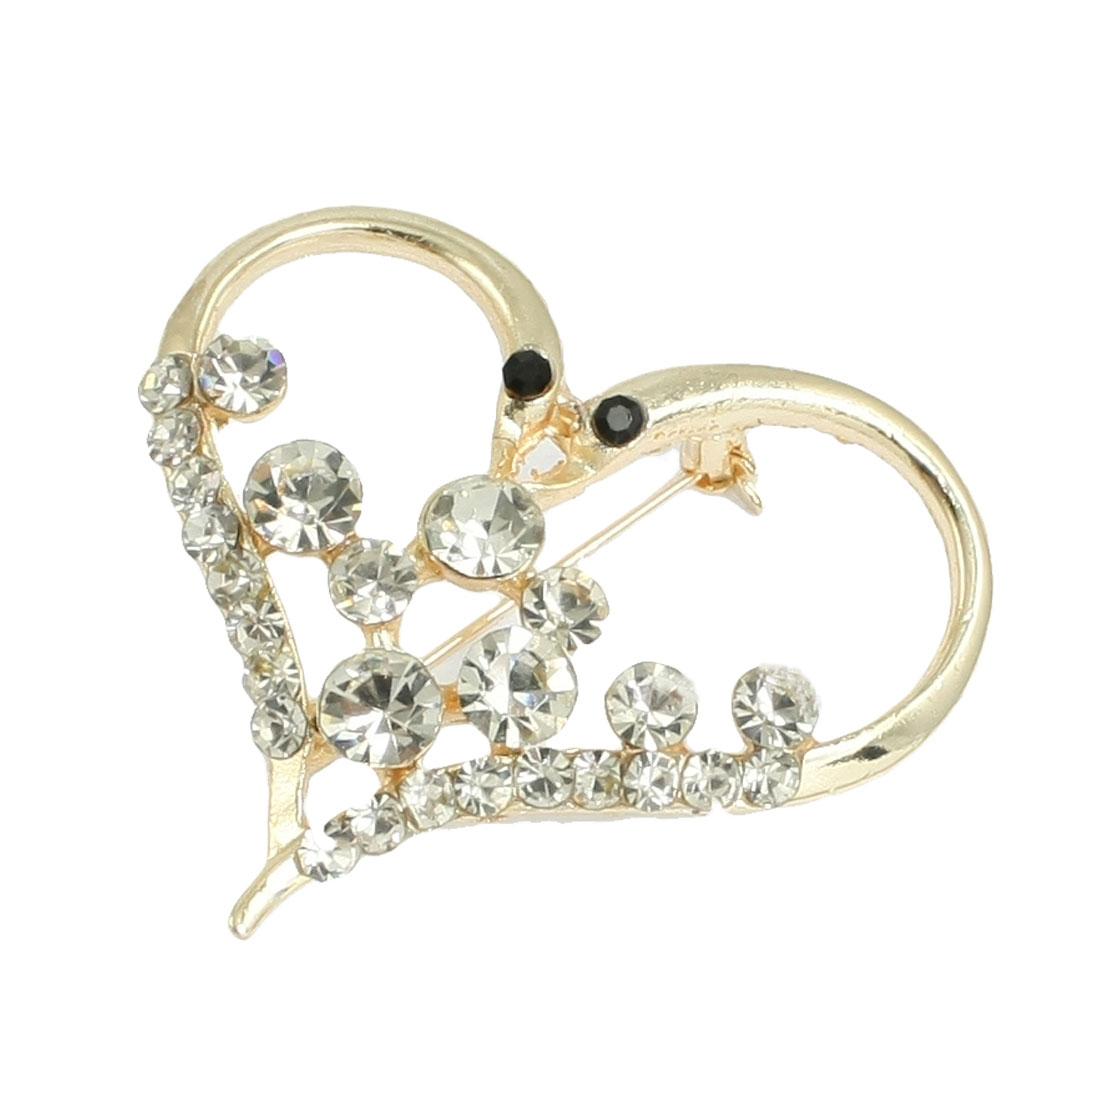 Lady Rhinestone Decor Heart Shape Metal Brooch Gold Tone